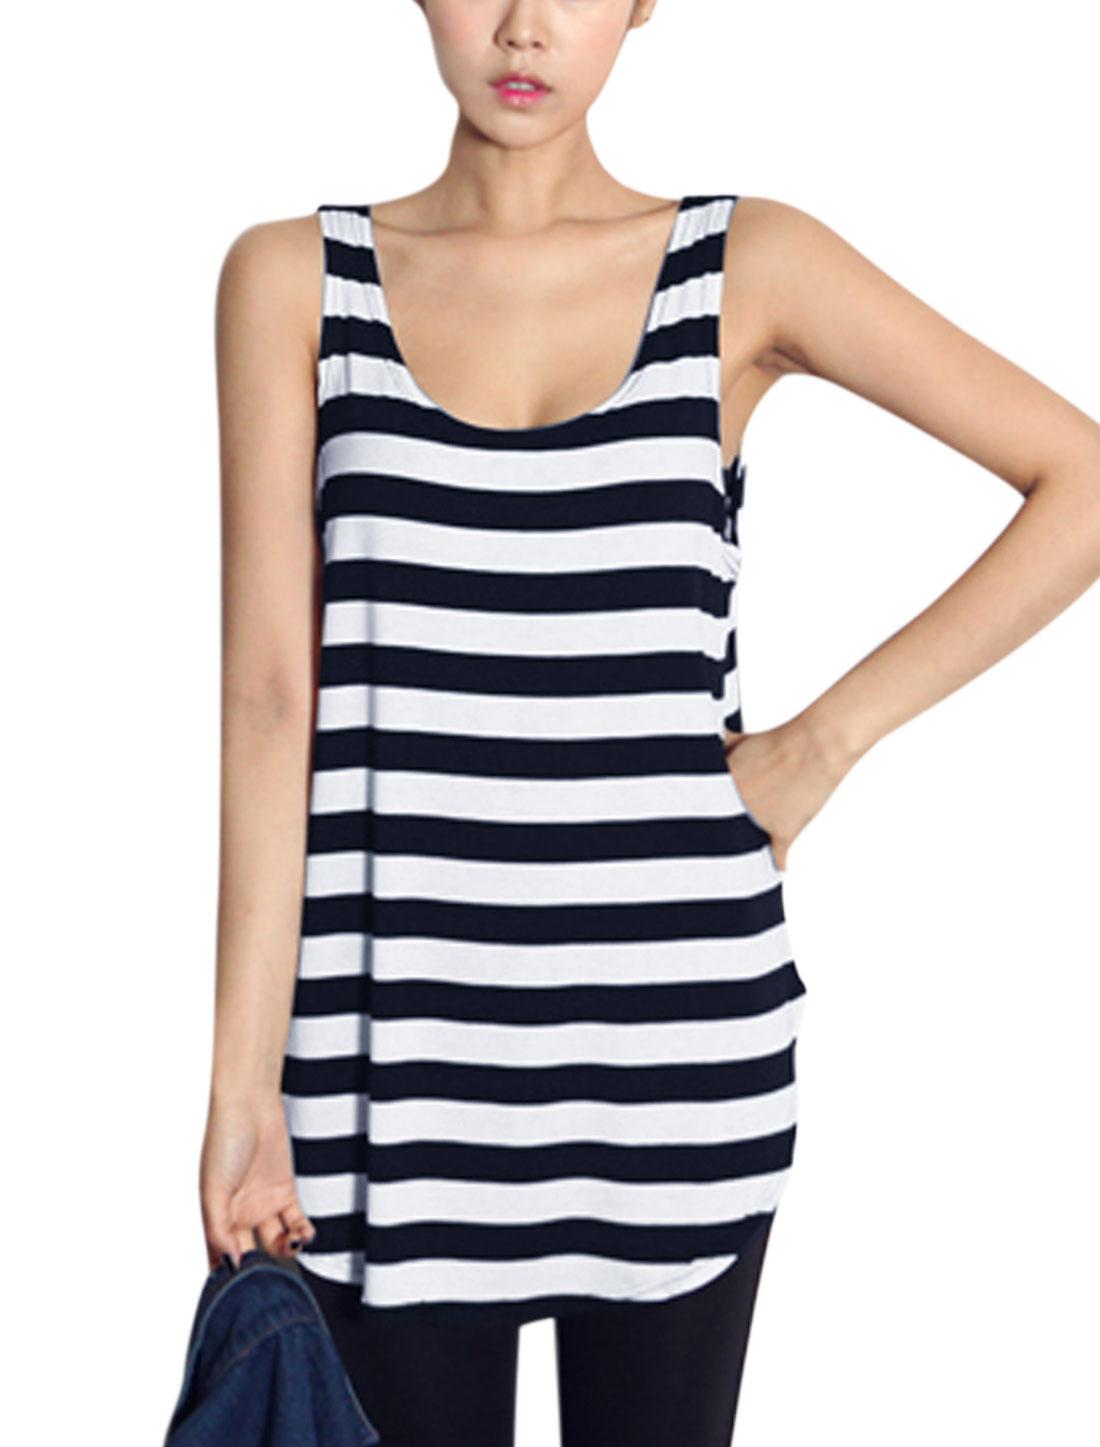 Woman Stripes Scoop Neck Sleeveless Round Hem Tunic Top Black White XS